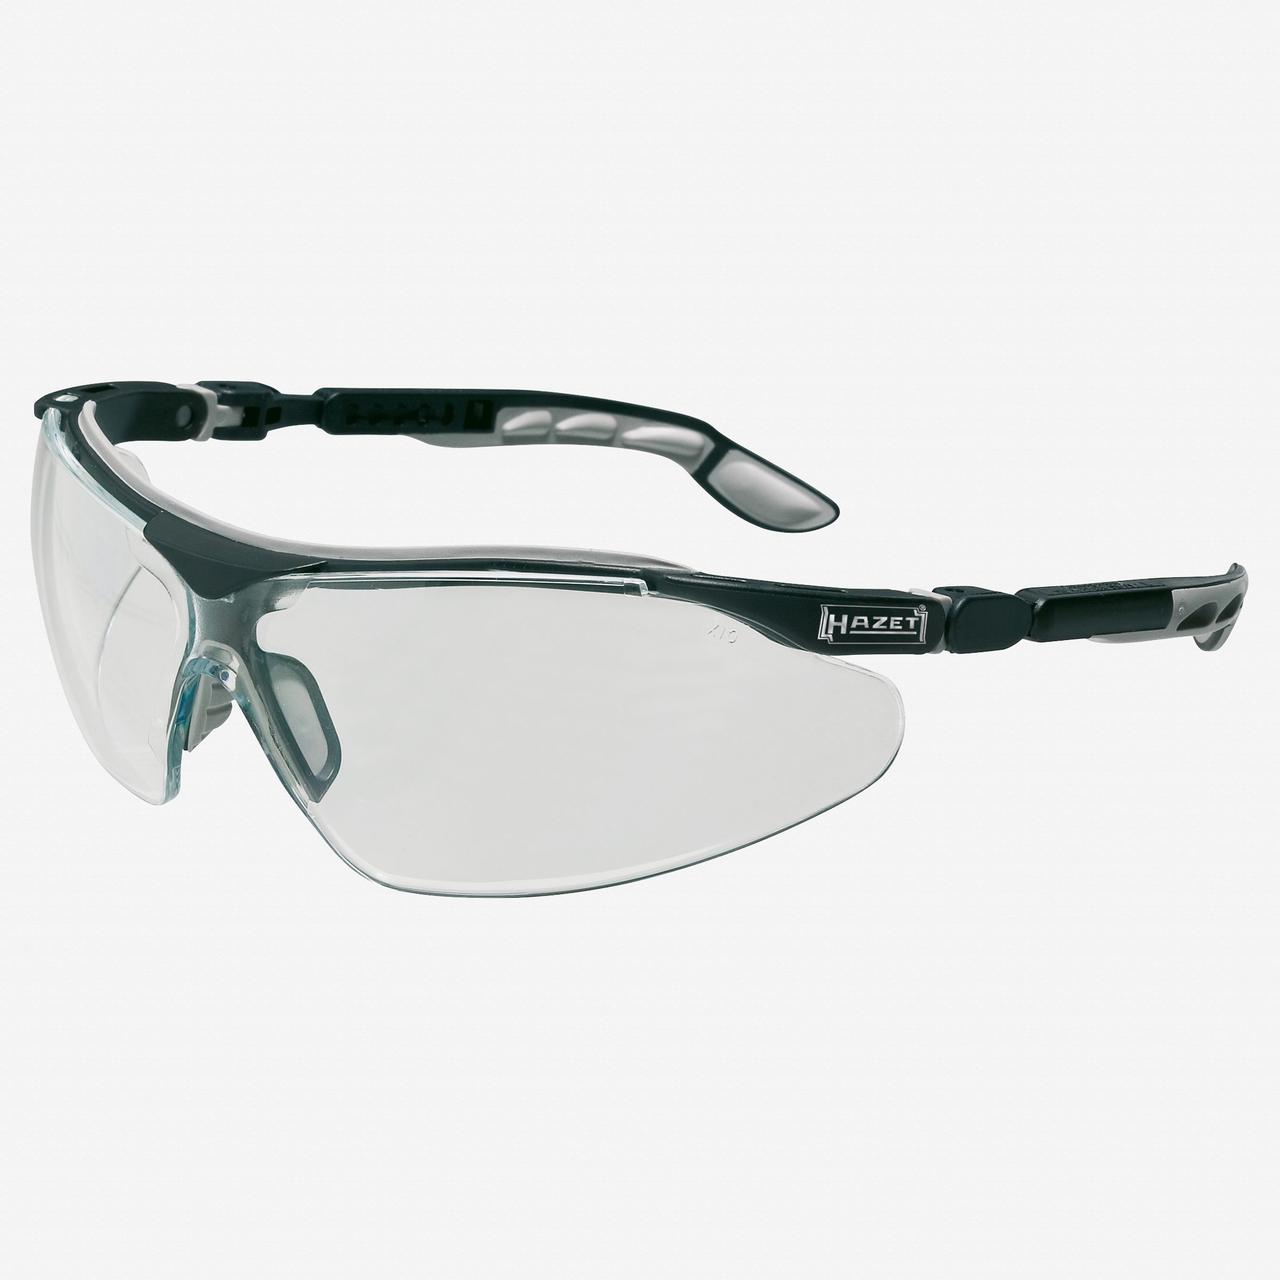 Hazet 1985-1 Safety glasses  - KC Tool